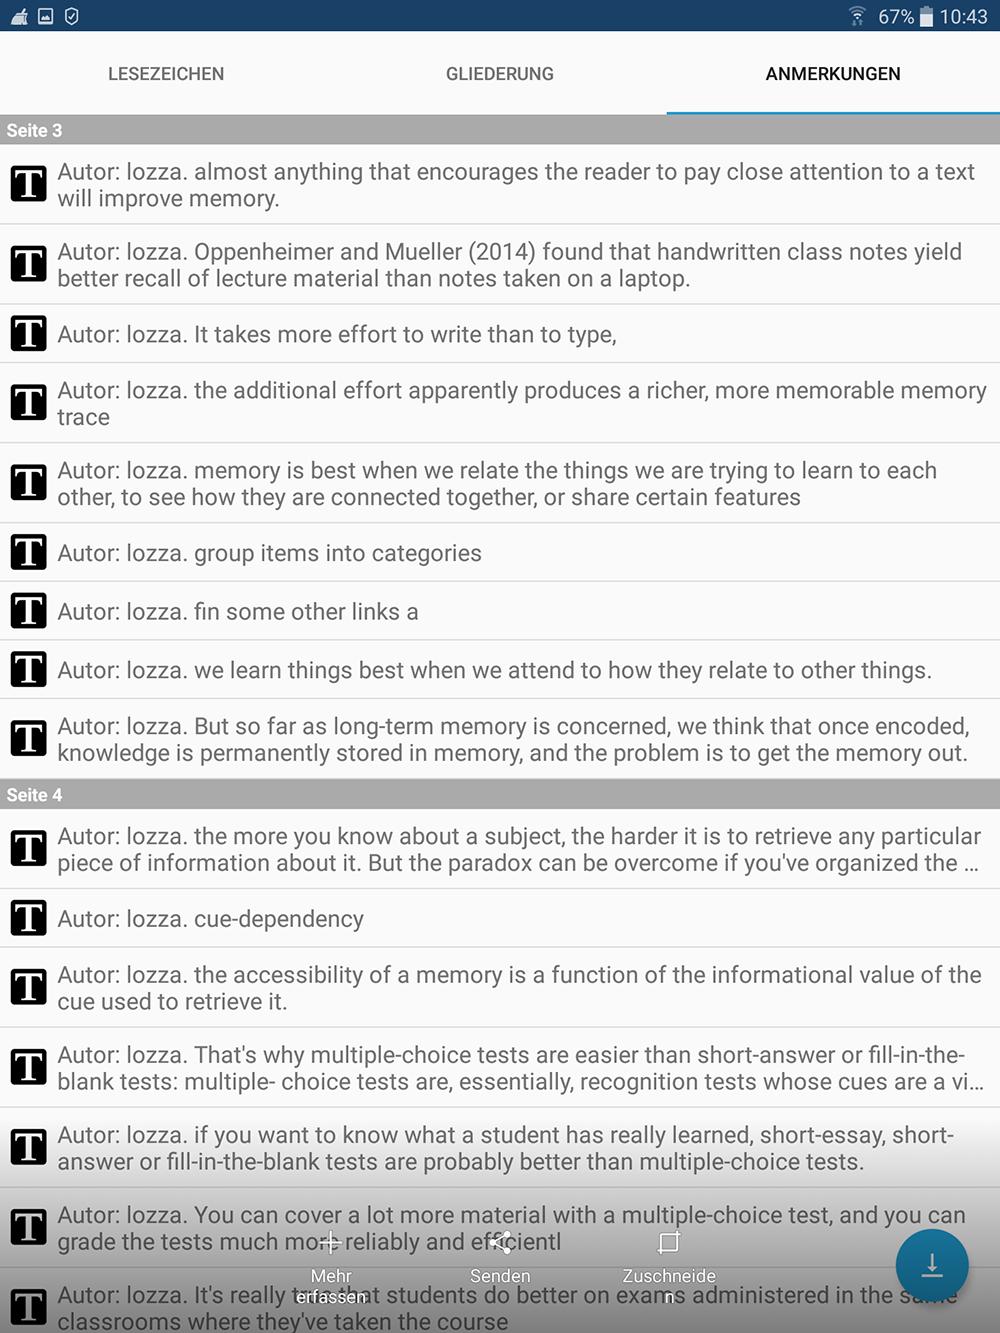 PDF bearbeiten | Projektblog papierloses Studium